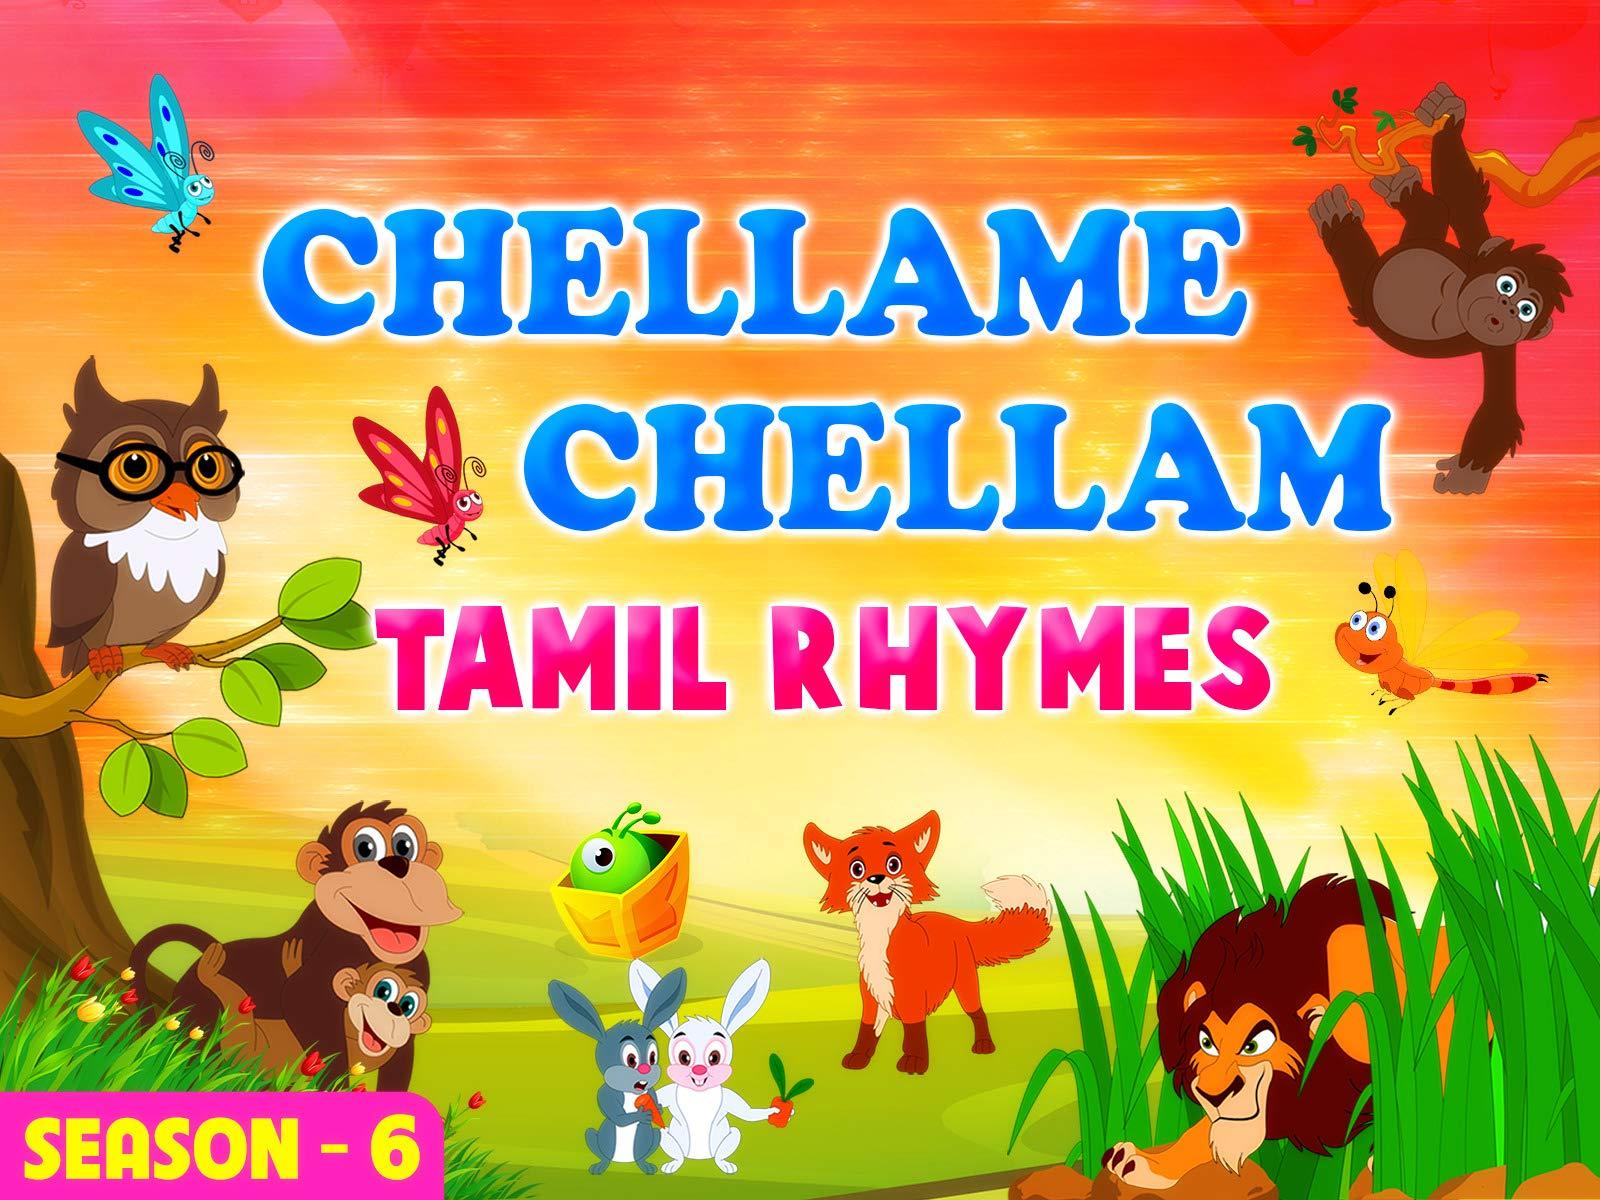 Chellame Chellam - Season 6